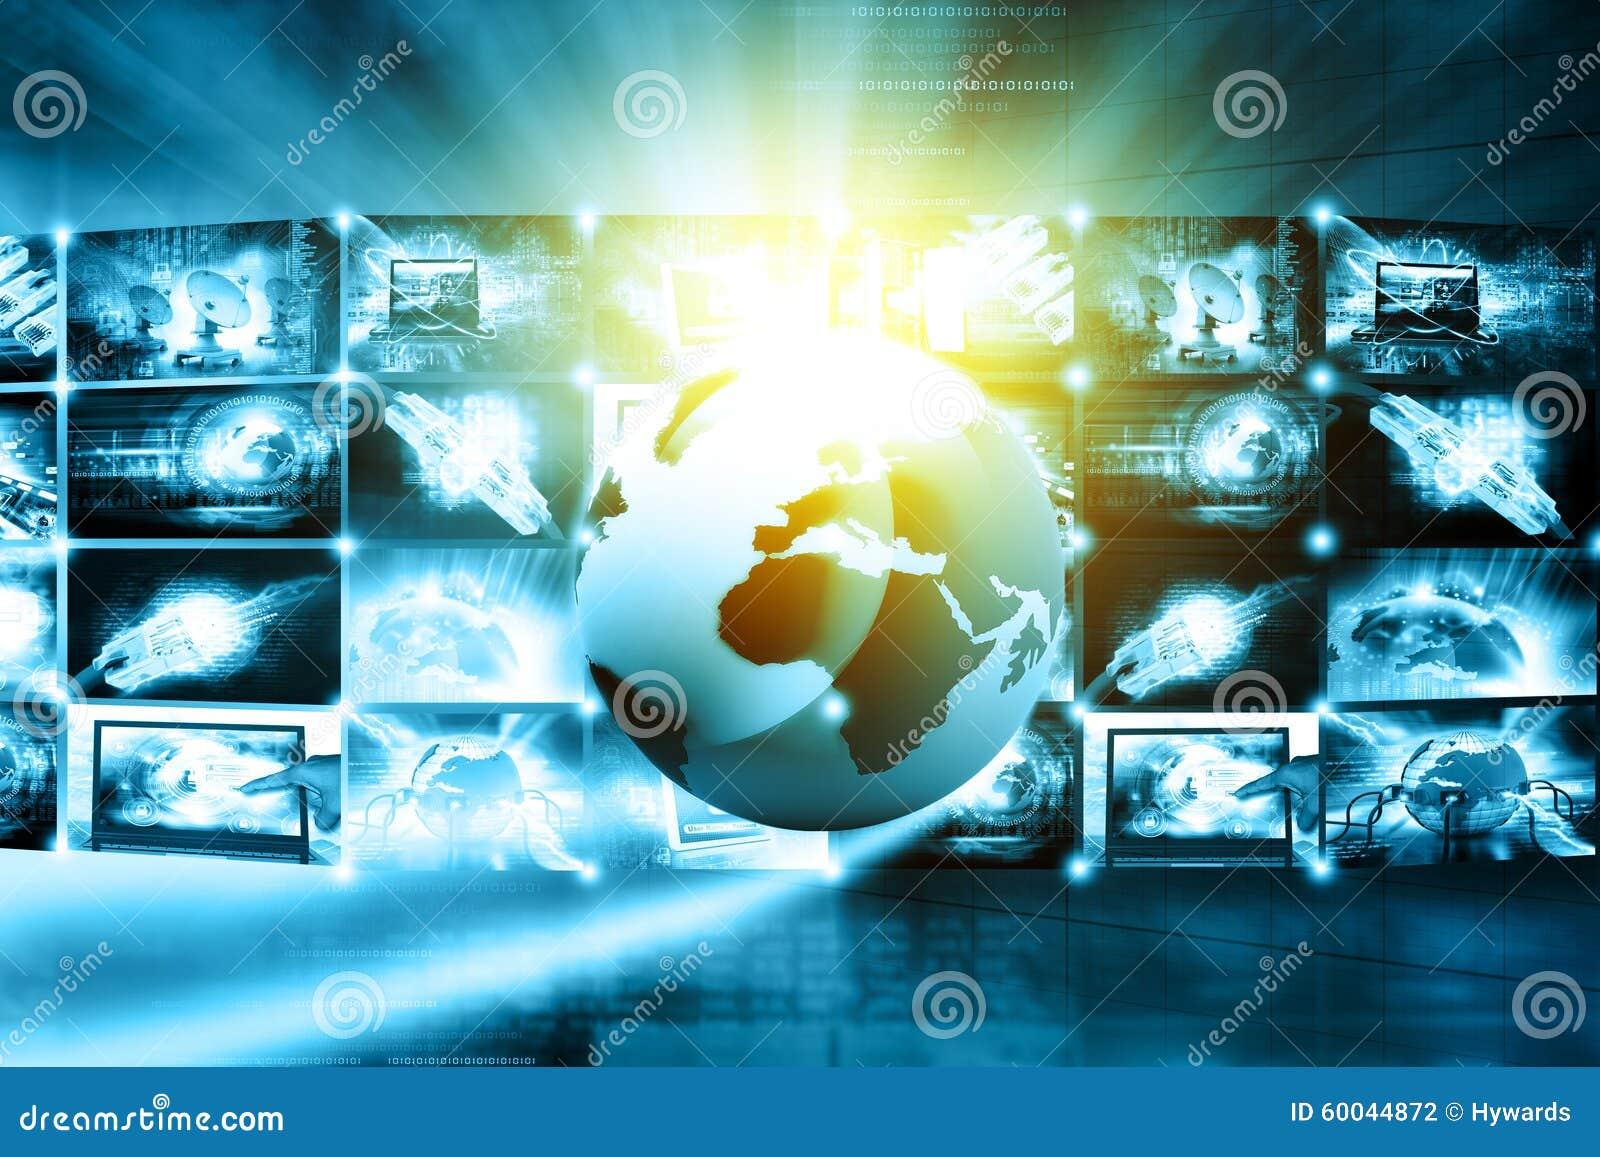 Time Management And Technology: Data Management Technology Stock Illustration